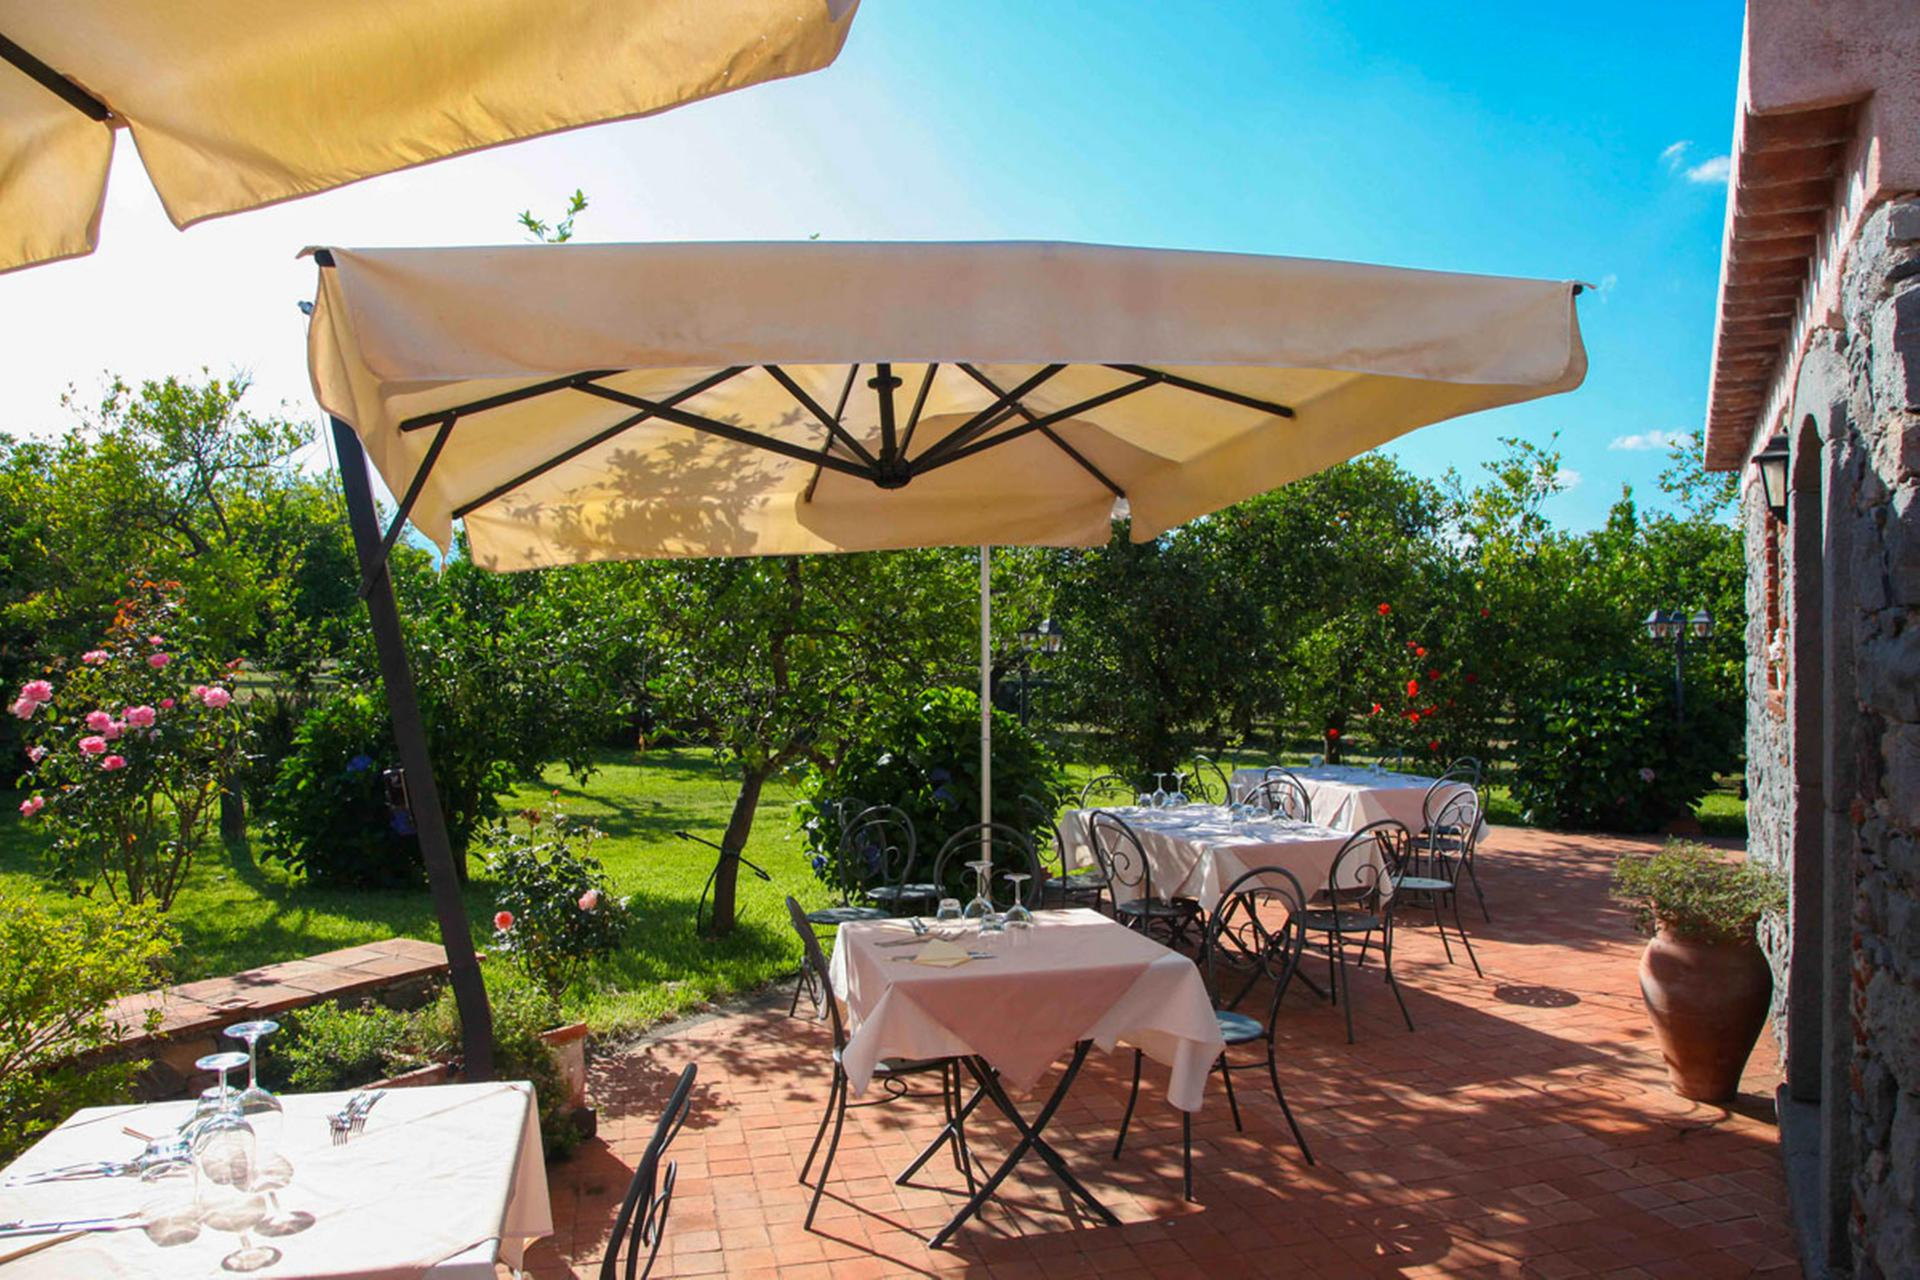 Agriturismo Sicilie Agriturismo tussen de citrusbomen in Sicilie